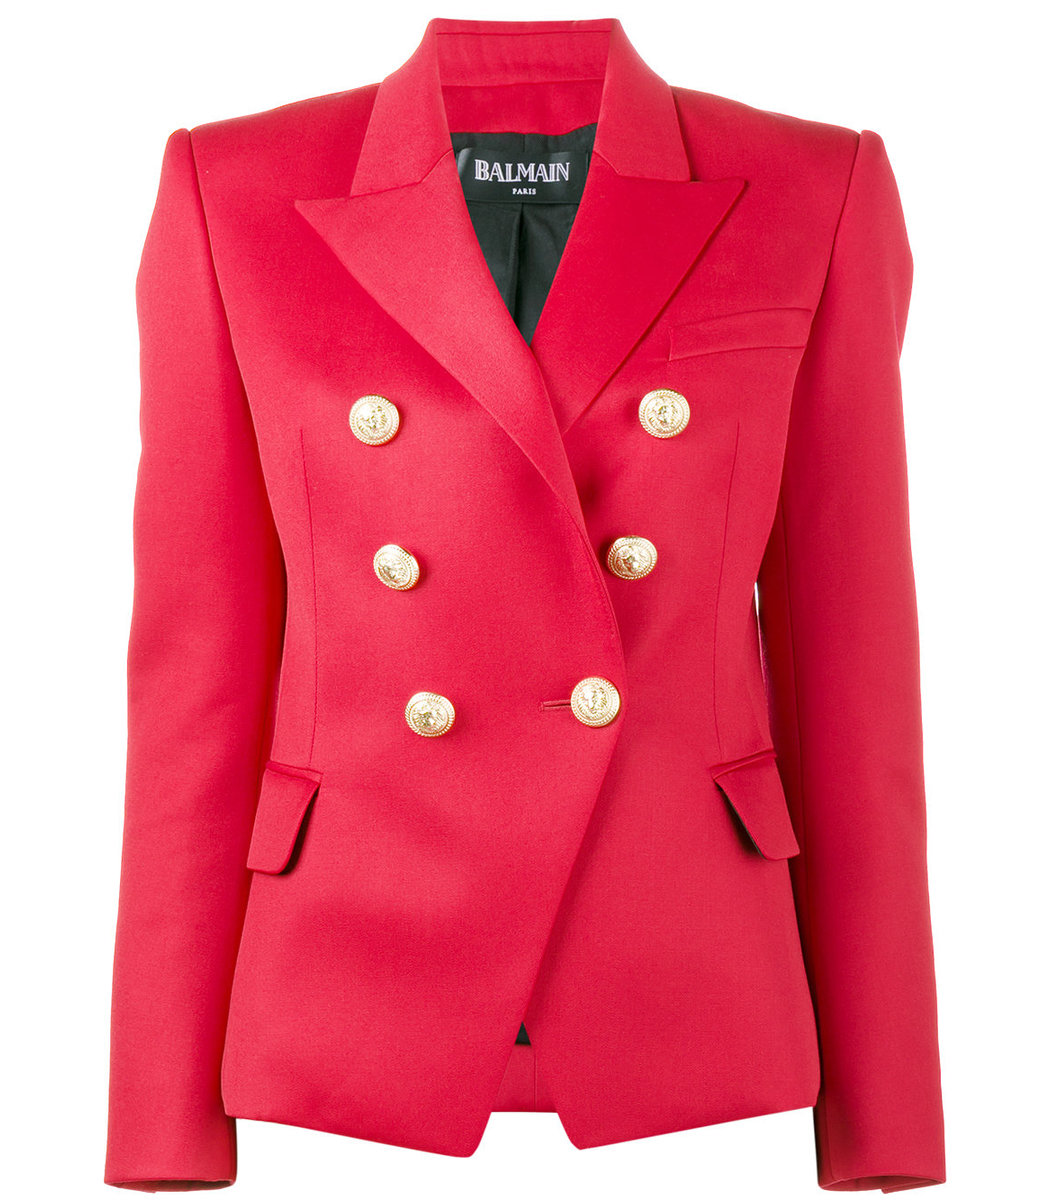 Leather Jacket Balmain | Double Brested Blazer | Balmain Double Breasted Blazer